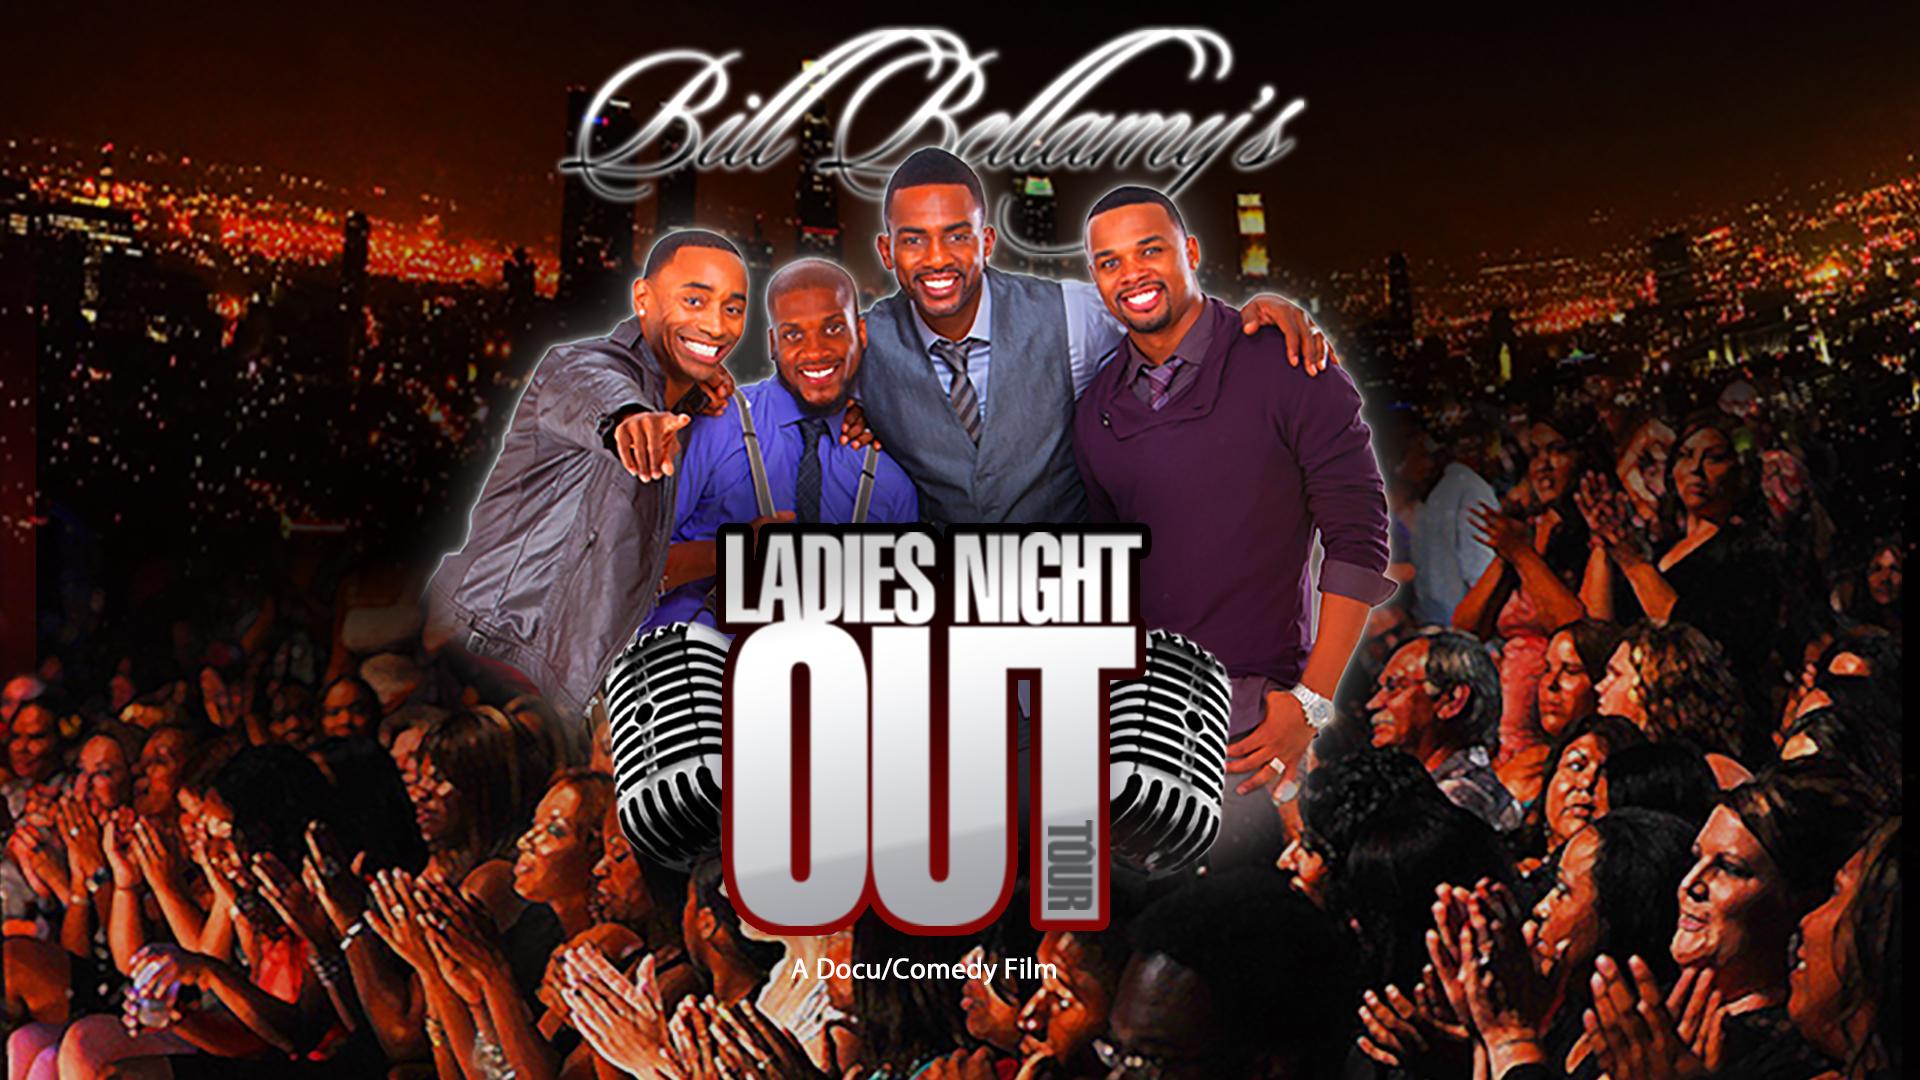 Bill Bellamy: Ladies Night Out